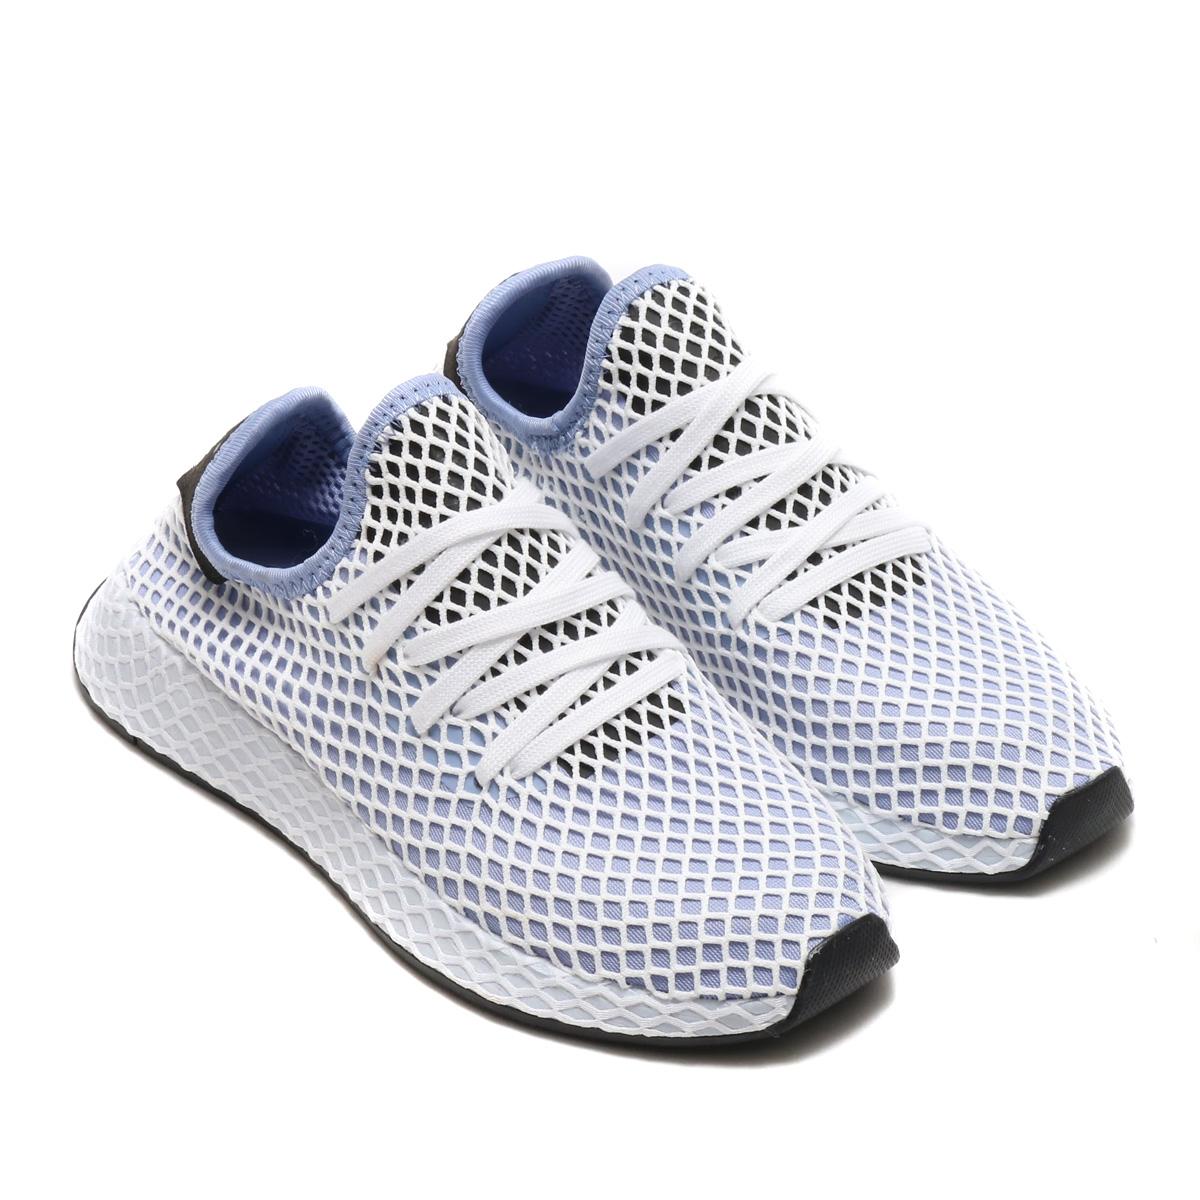 adidas Originals DEERUPT RUNNER W (アディダスオリジナルスディーラプトランナー W) (chalk blue  S18  chalk blue S18  core black) 18SS-I fa110a9c9